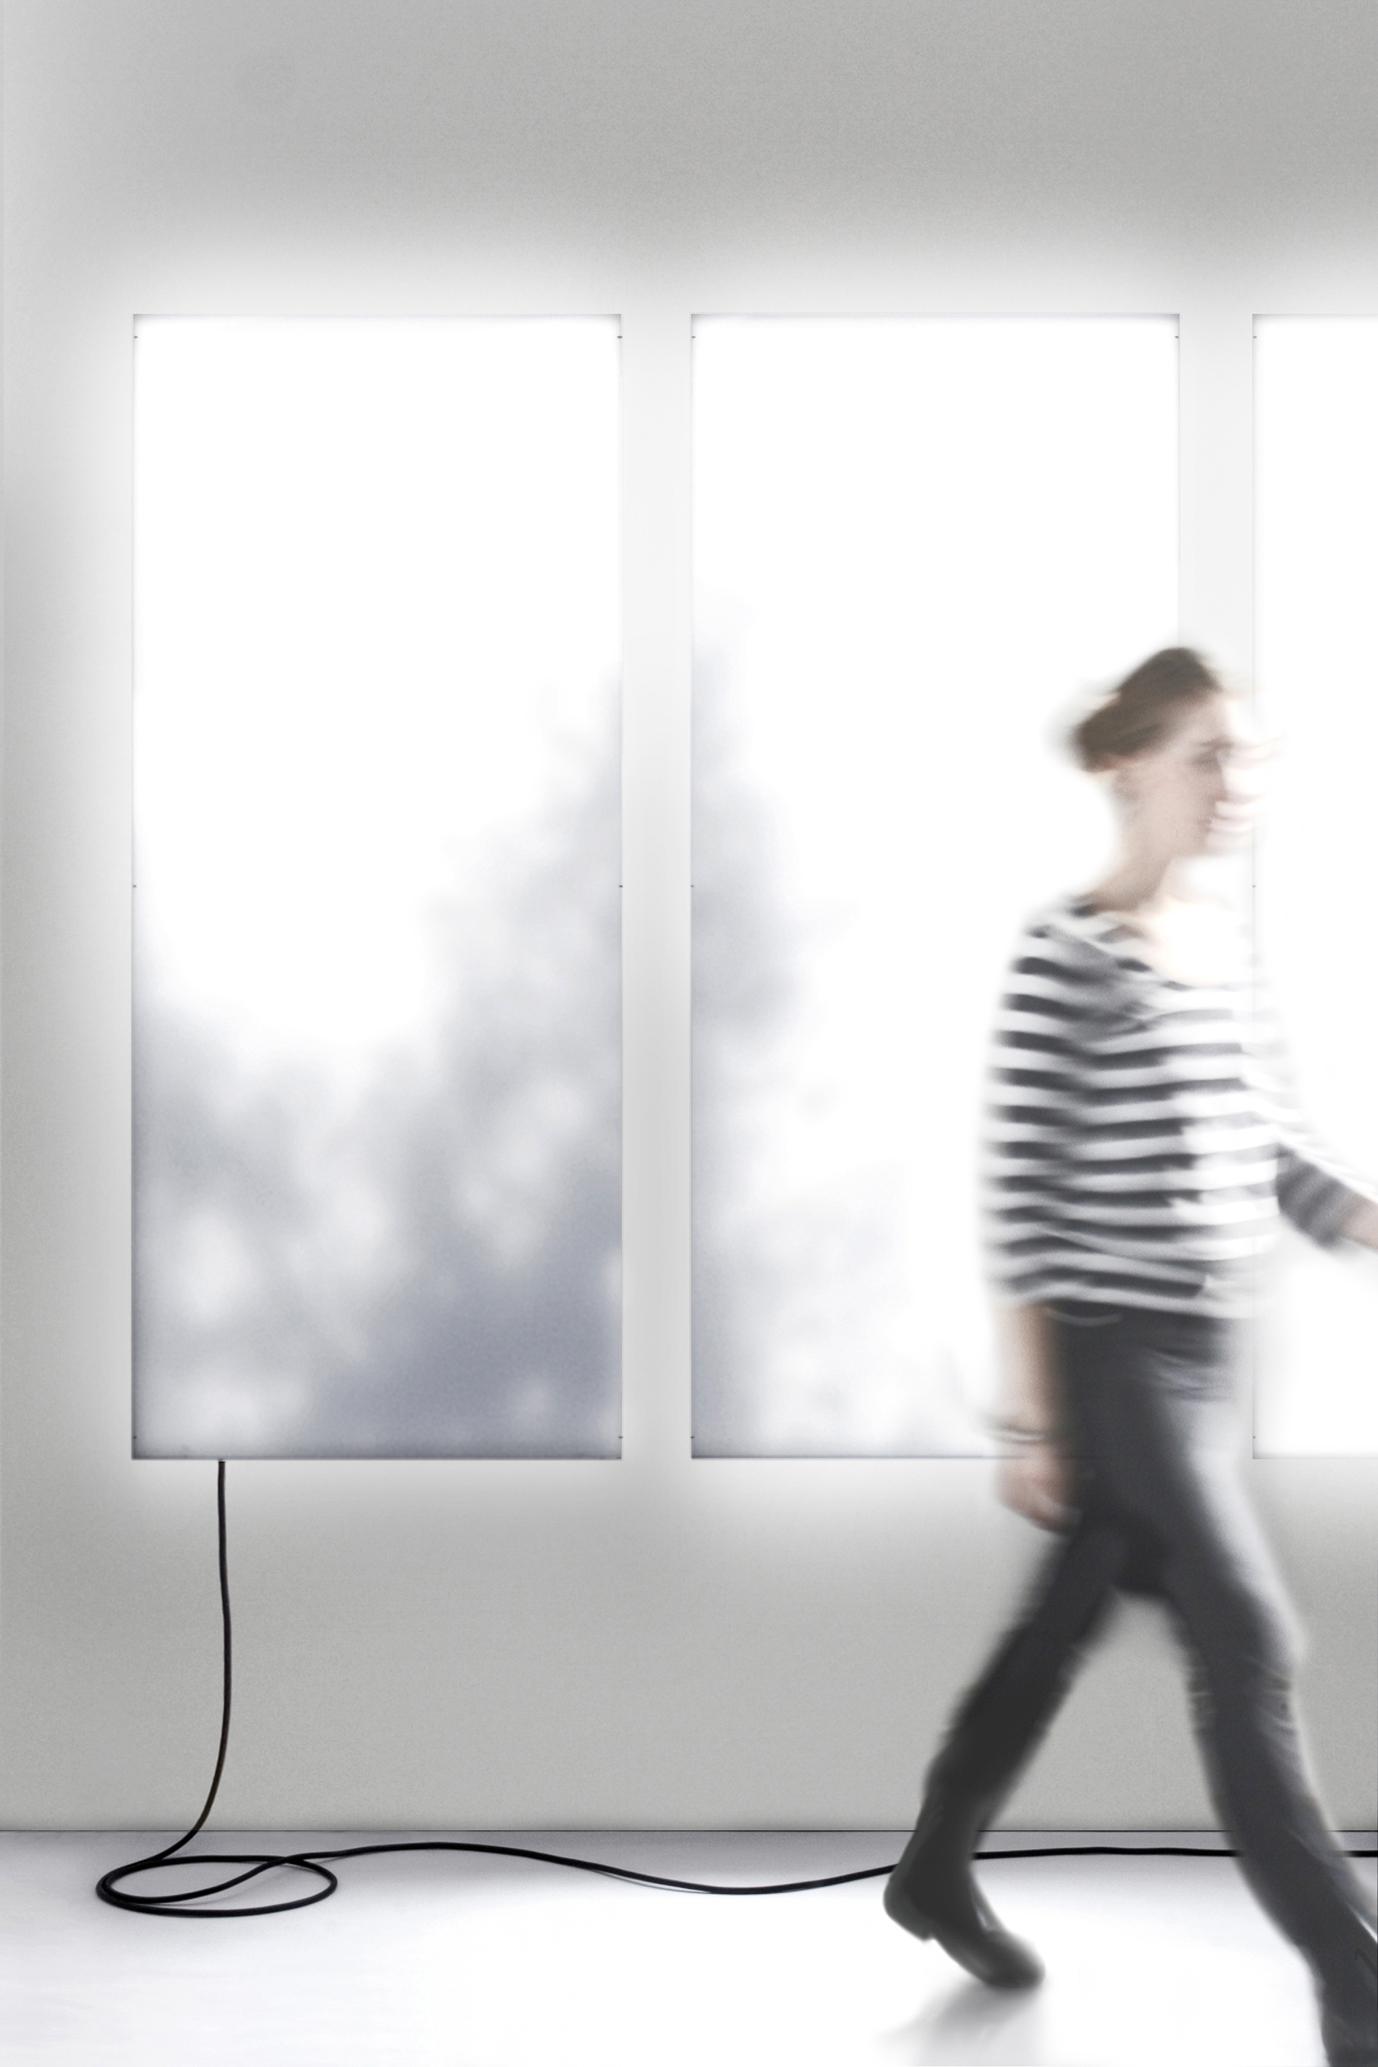 Sideways - On The Dancefloor